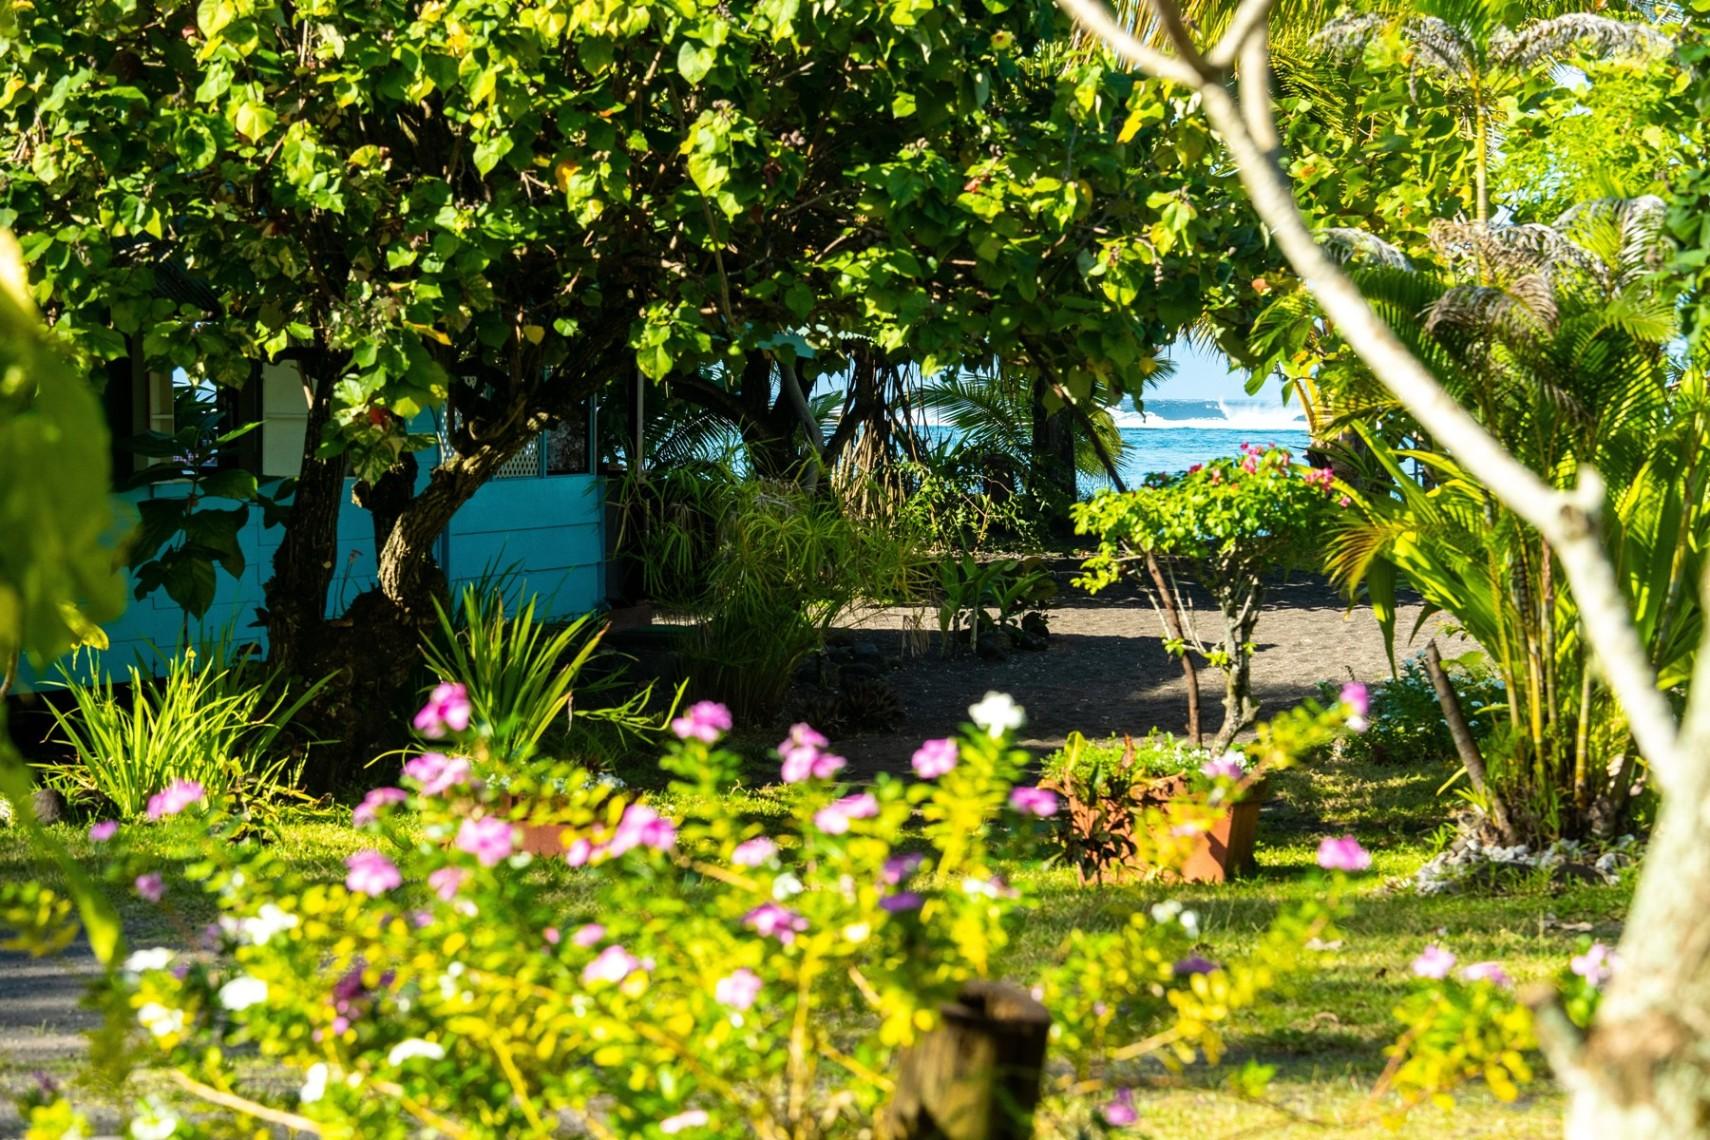 https://tahititourisme.fr/wp-content/uploads/2019/08/copie-tahiti-tourisme-800ko-1.jpg